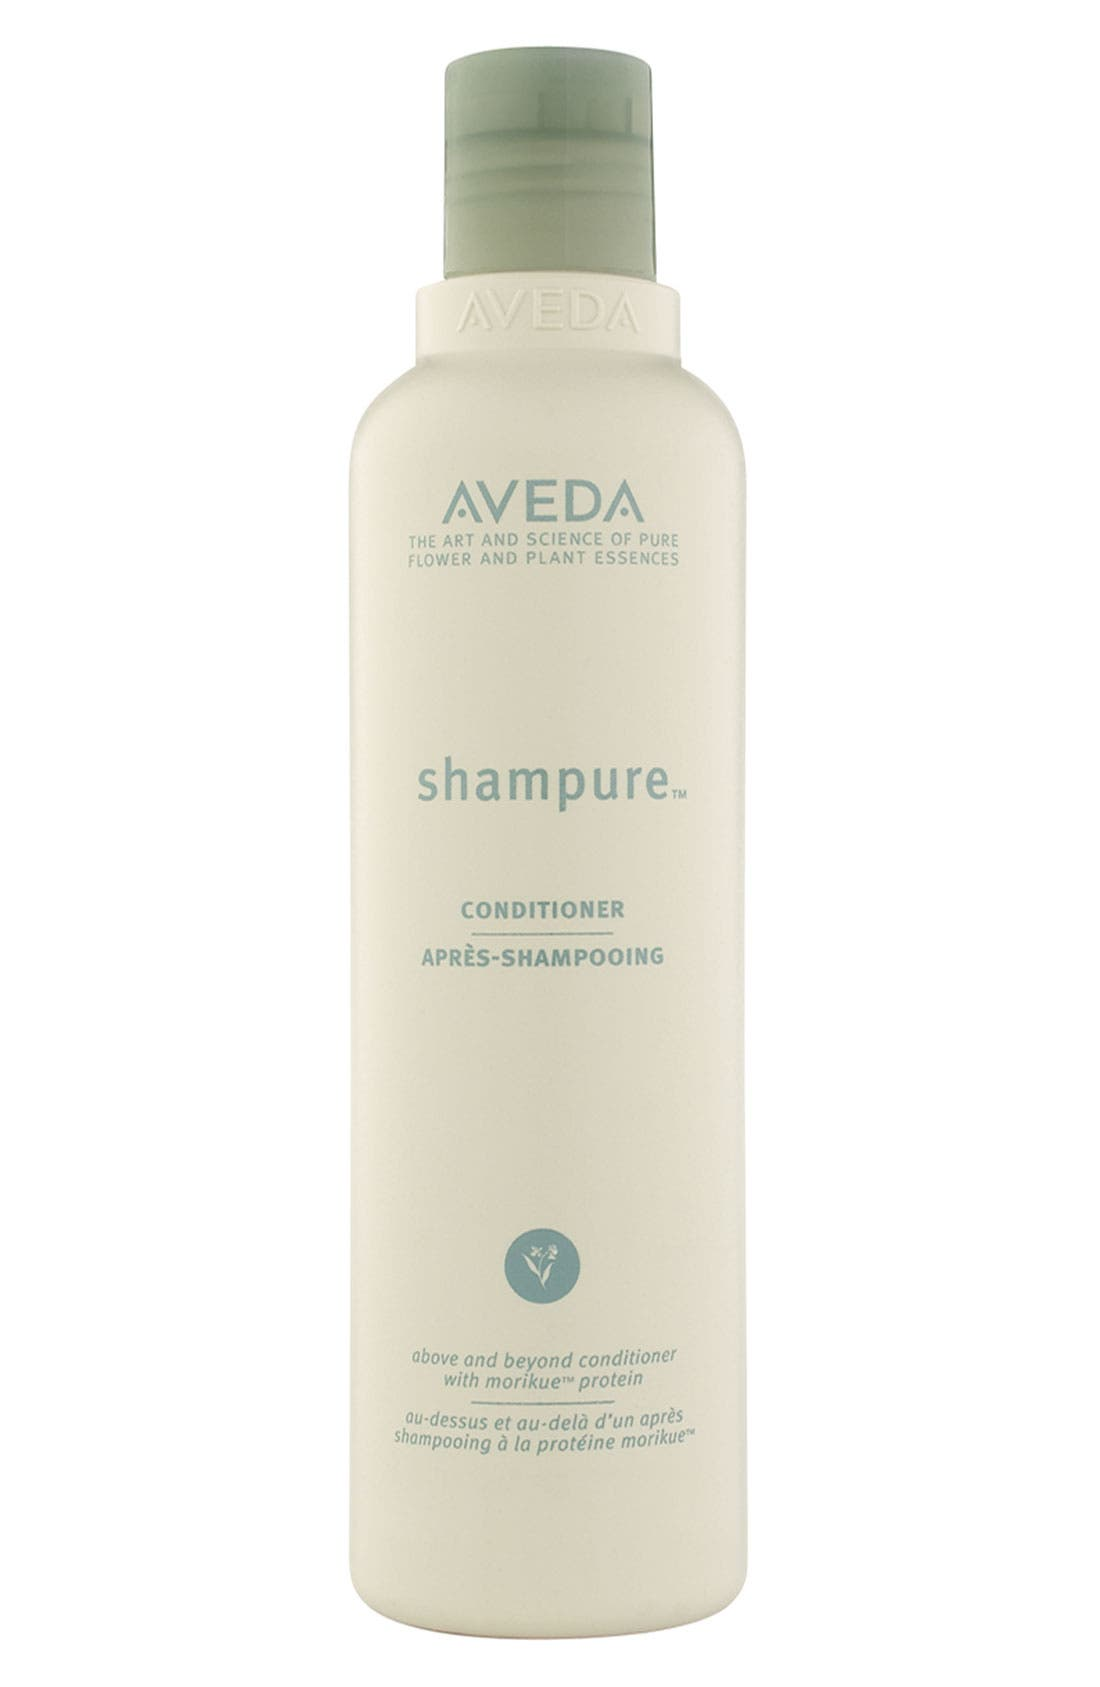 Aveda shampure™ Conditioner